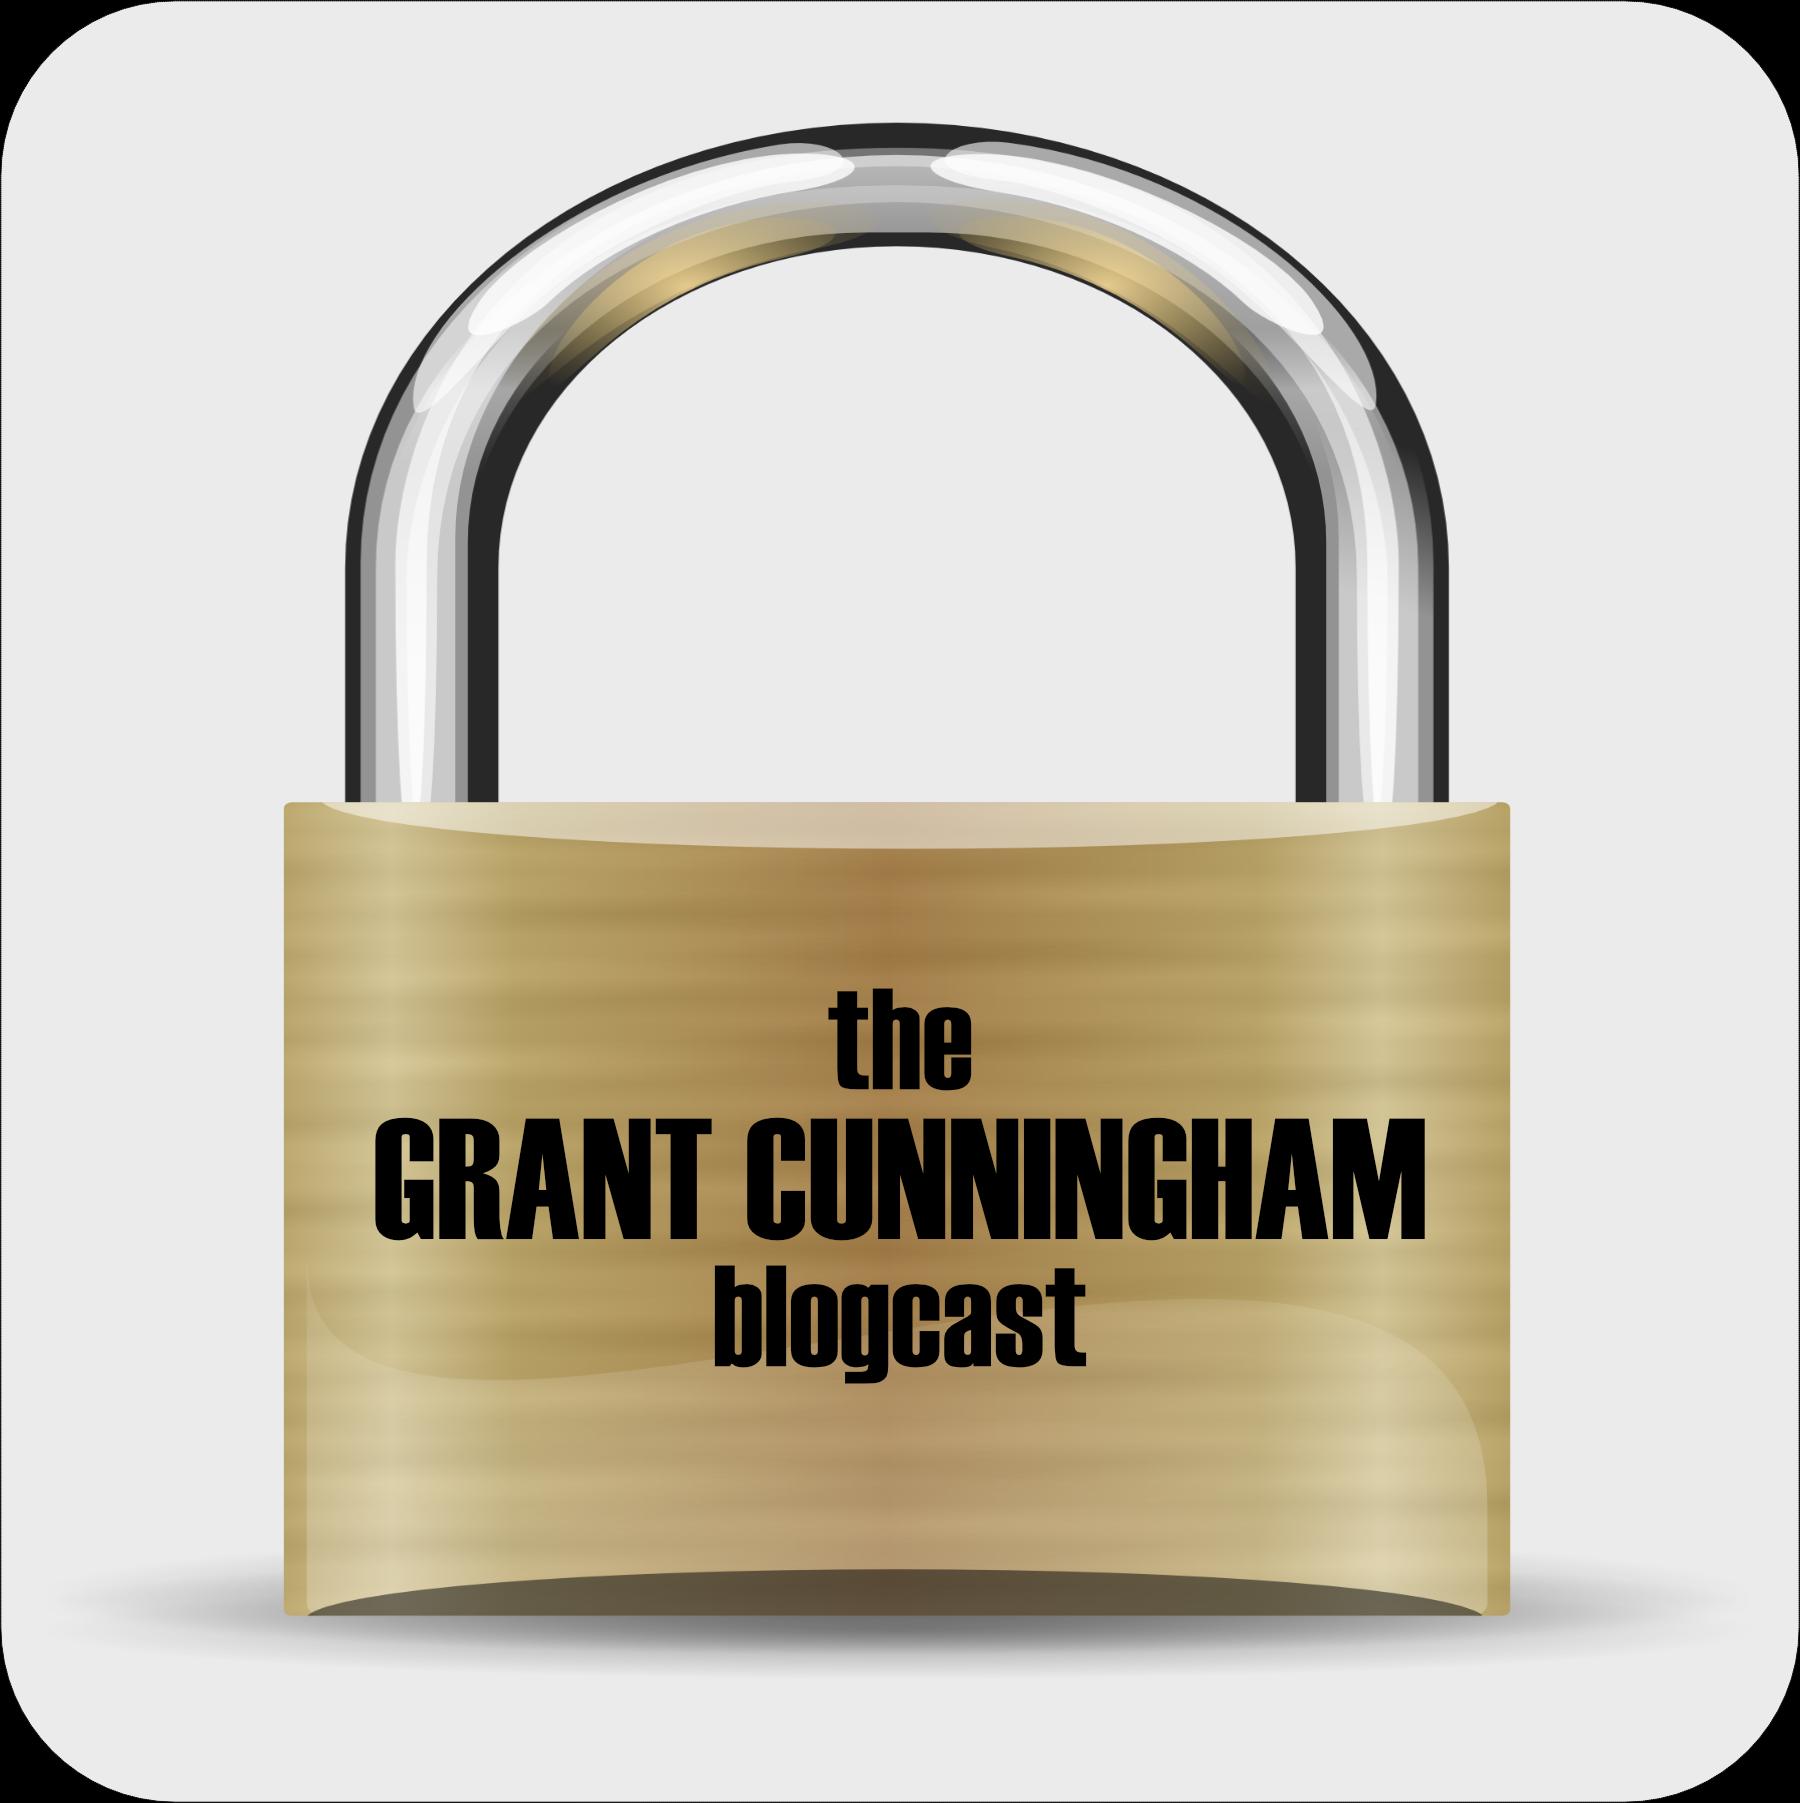 The Grant Cunningham Blogcast show art